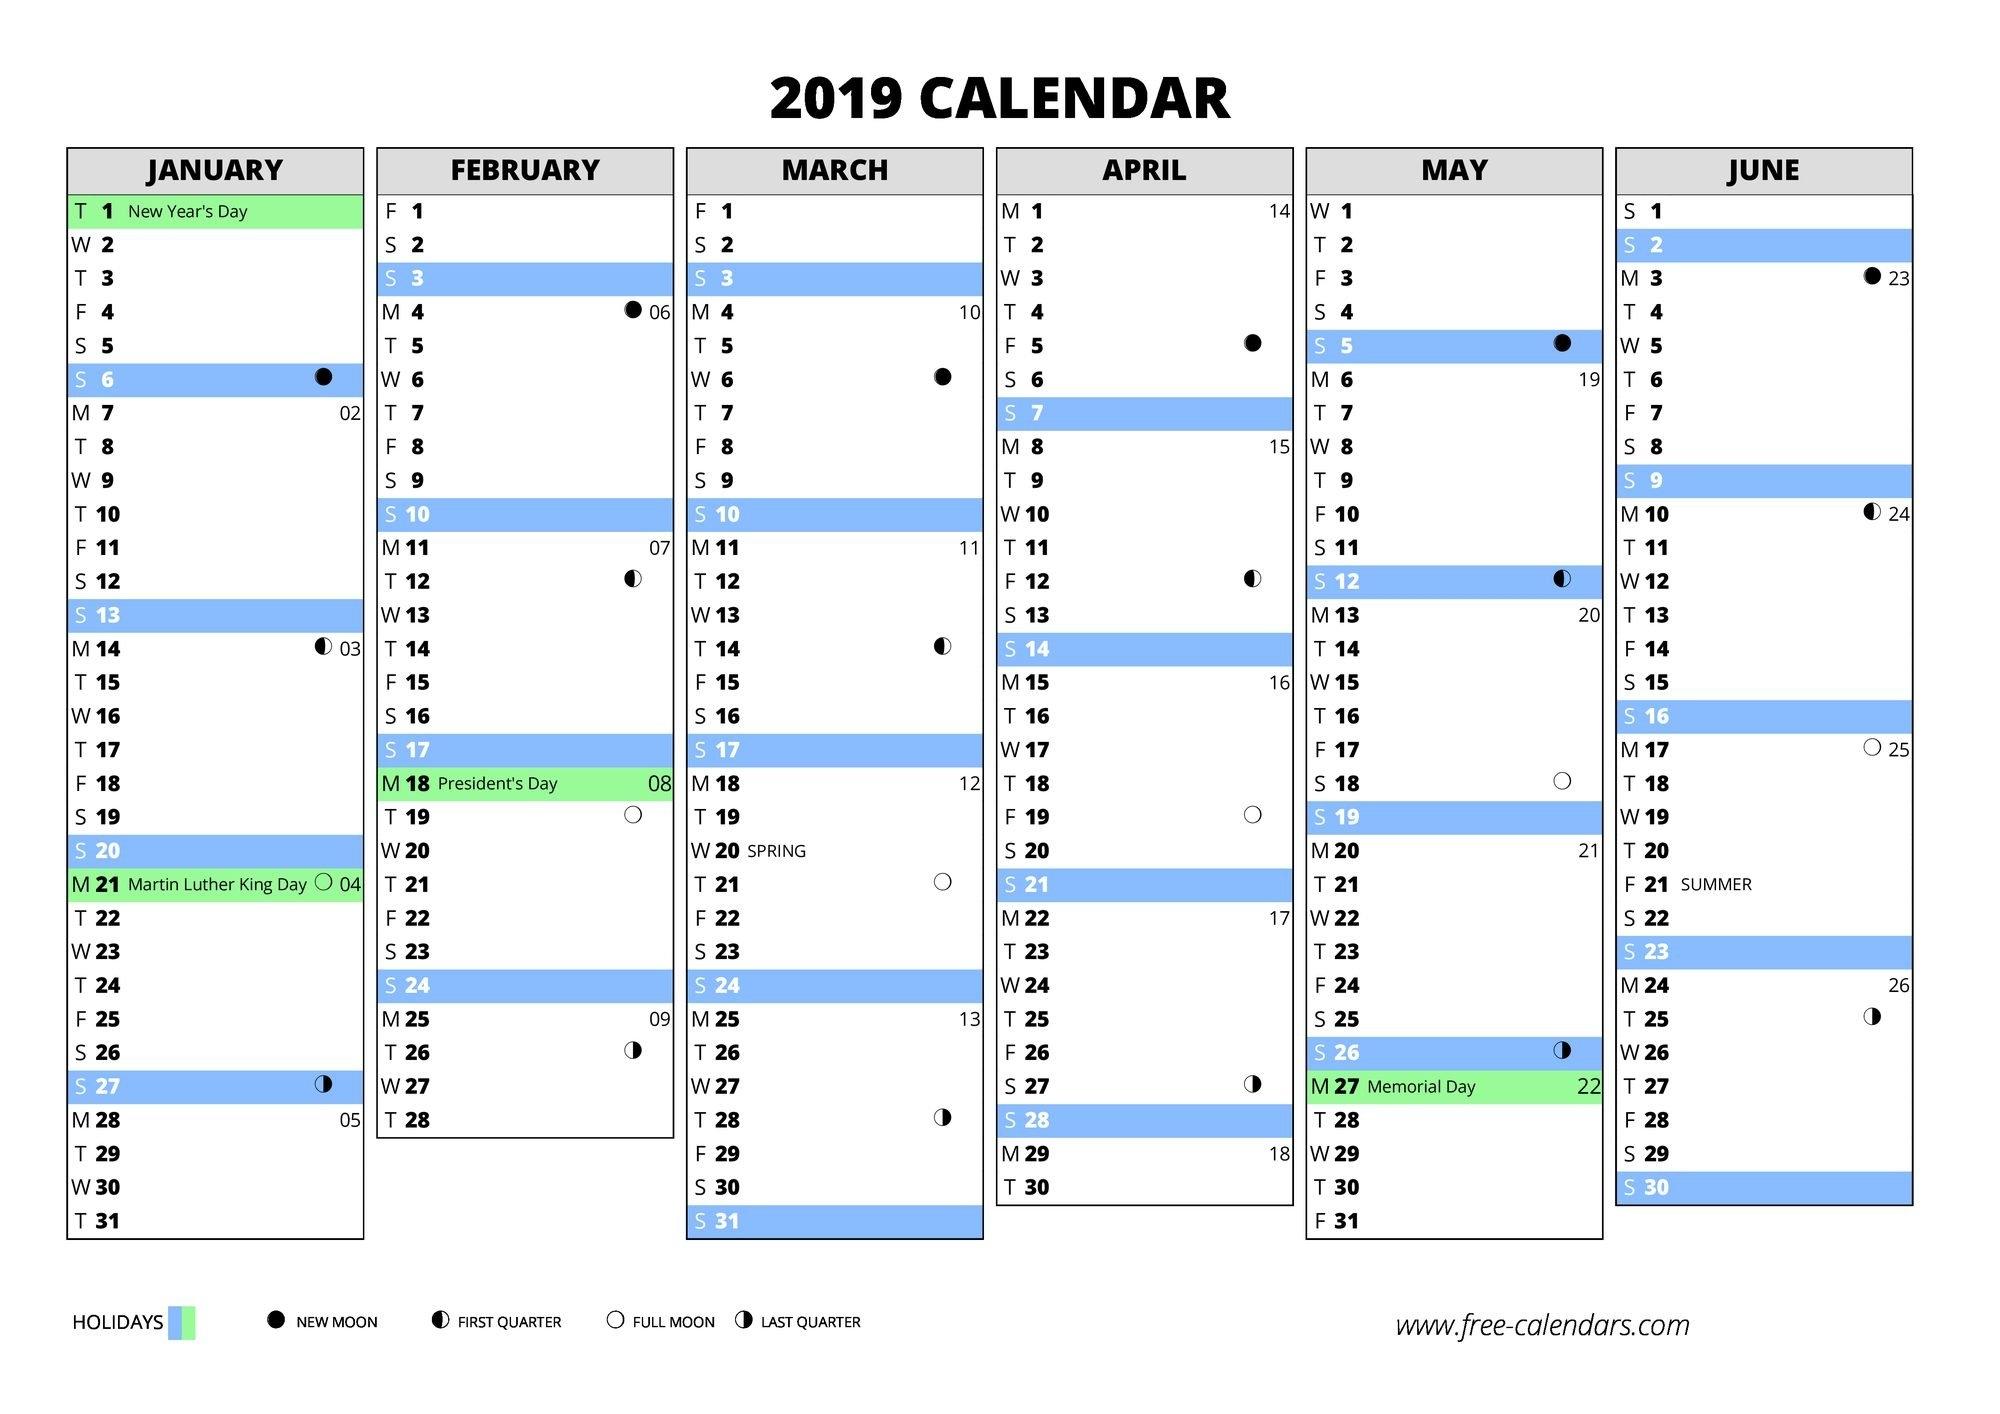 2019 Calendar ≡ Free-Calendars W 2019 Calendar